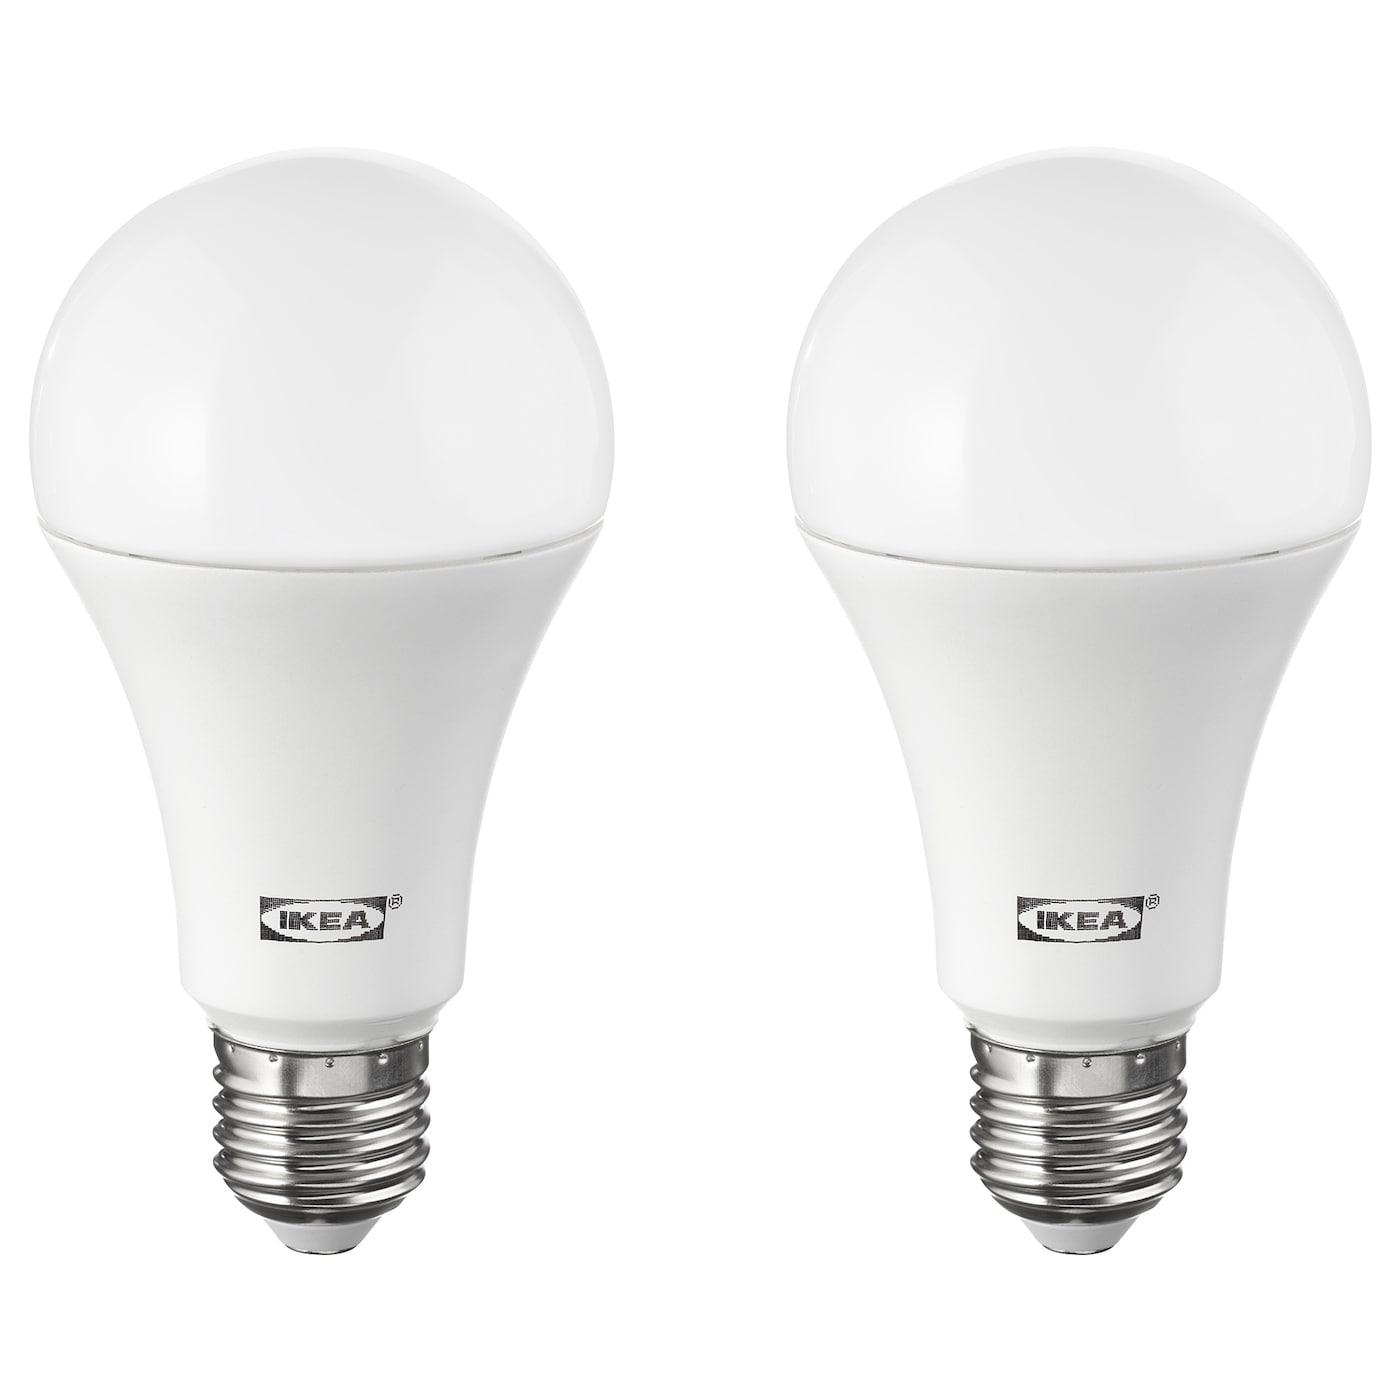 Light Bulbs Led Accessories Ikea Diagram See Image Comparing A Regular Bulb And Fluorescent Ryet E27 1600 Lumen